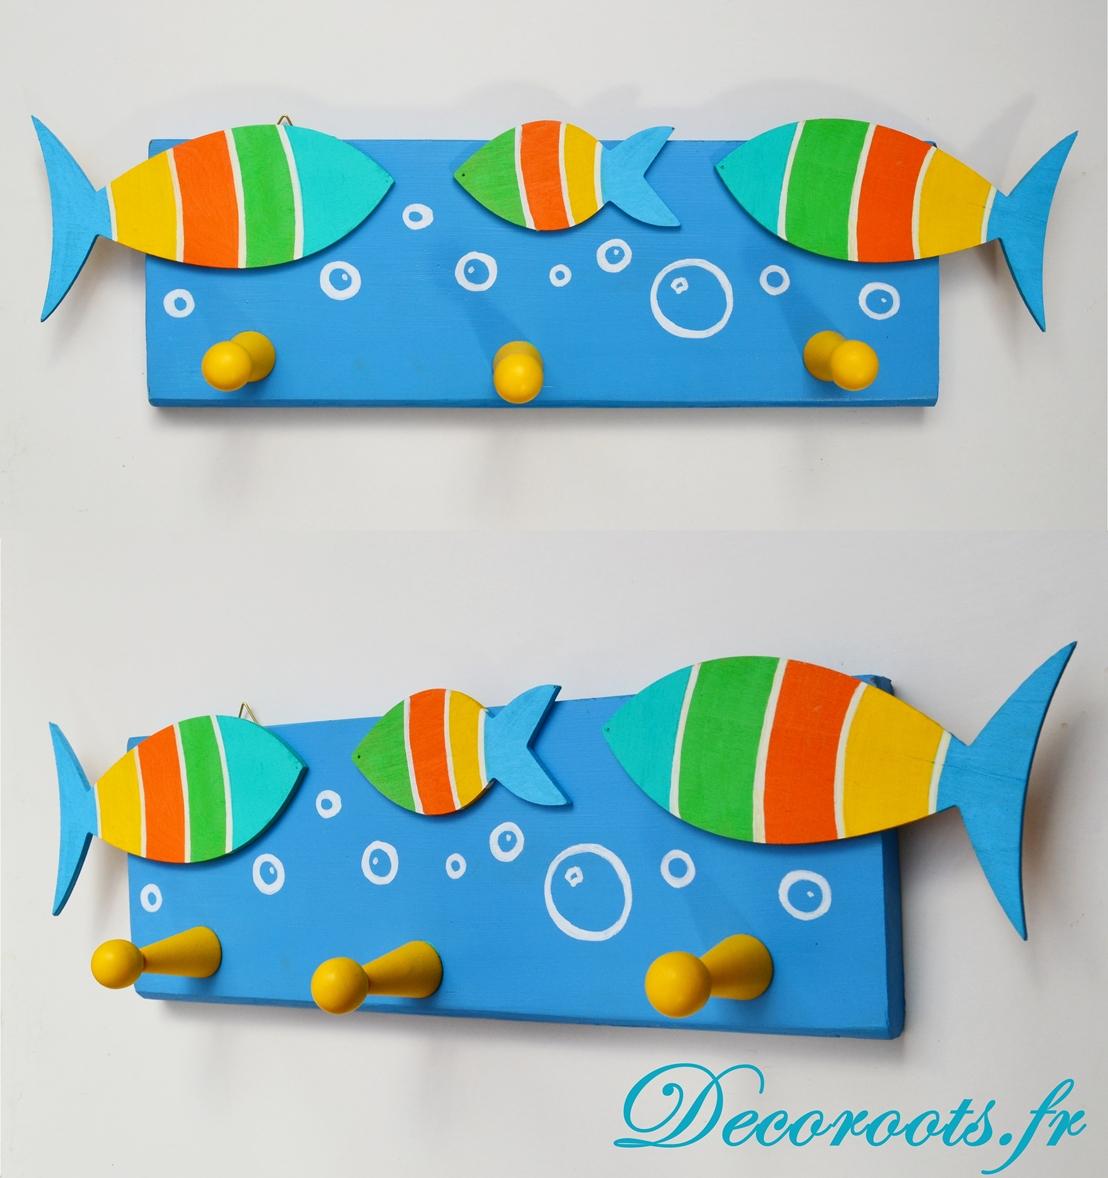 porte manteau poisson thème mer marin marine bord de mer bleu turquoise vert orange jaune 3